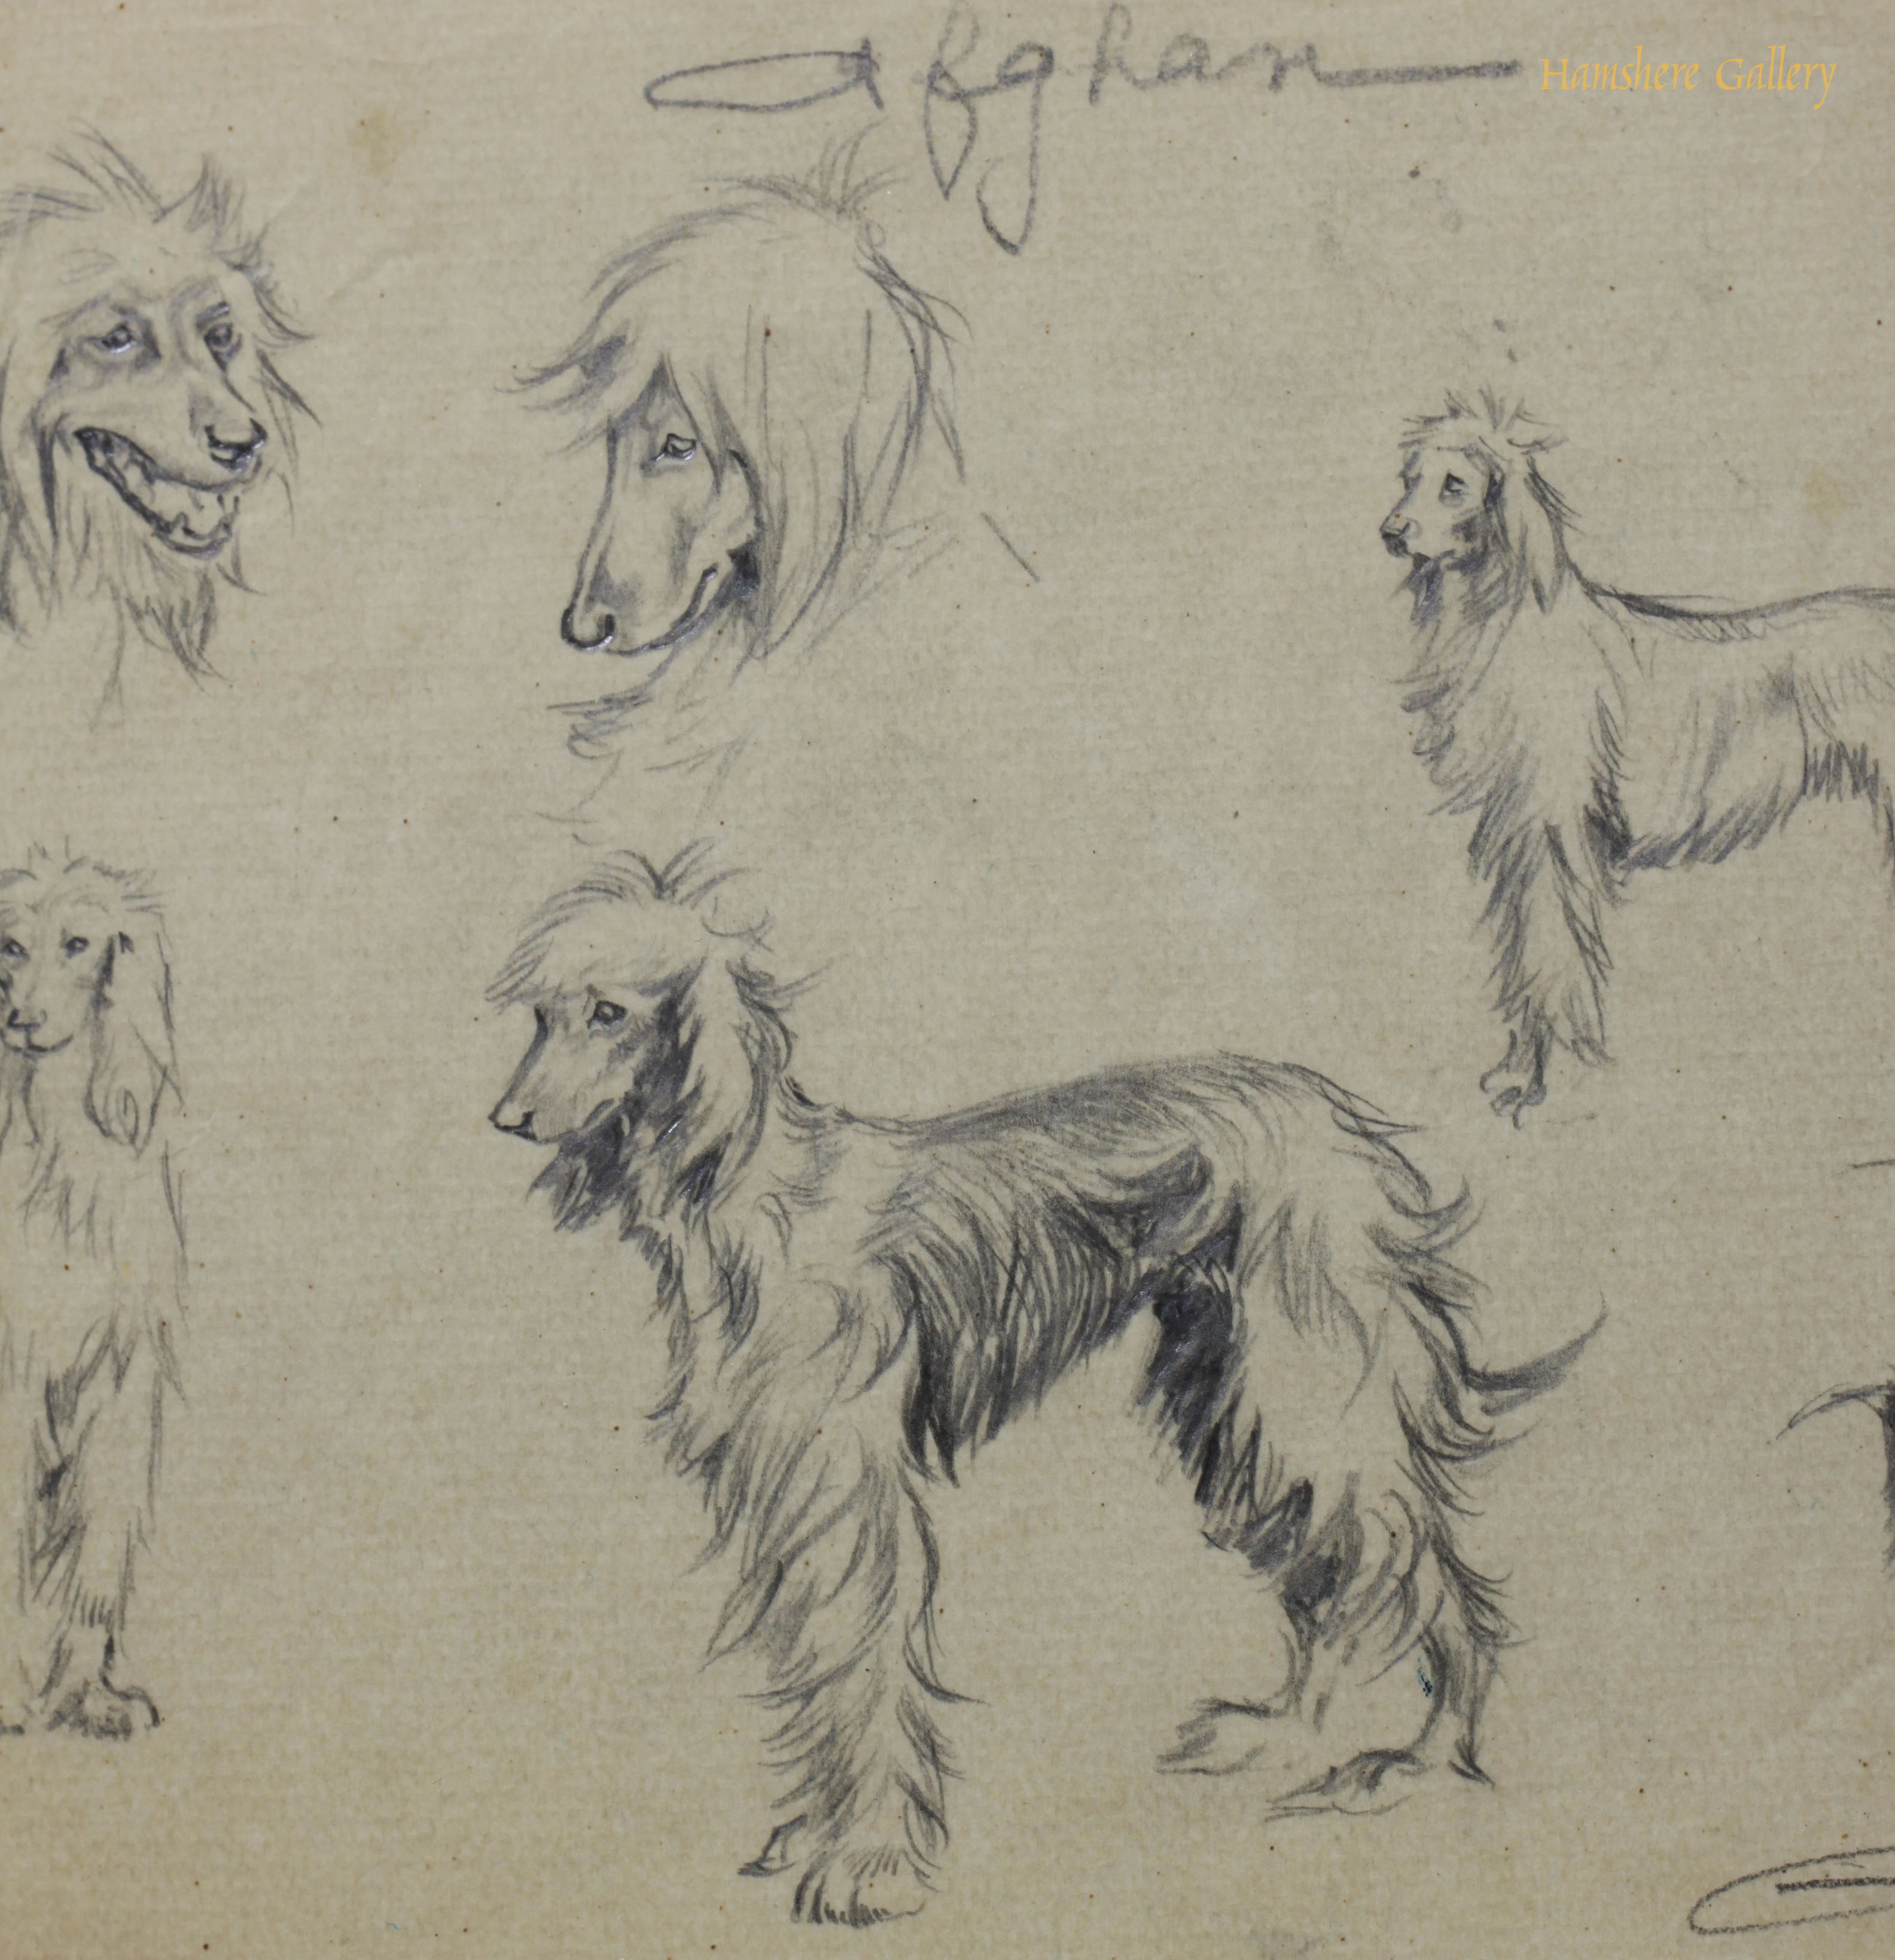 Click for larger image: Afghan Hound pencil studies by Borris O�Klein / Jean Herblet  - Afghan Hound pencil studies by Borris O�Klein / Jean Herblet